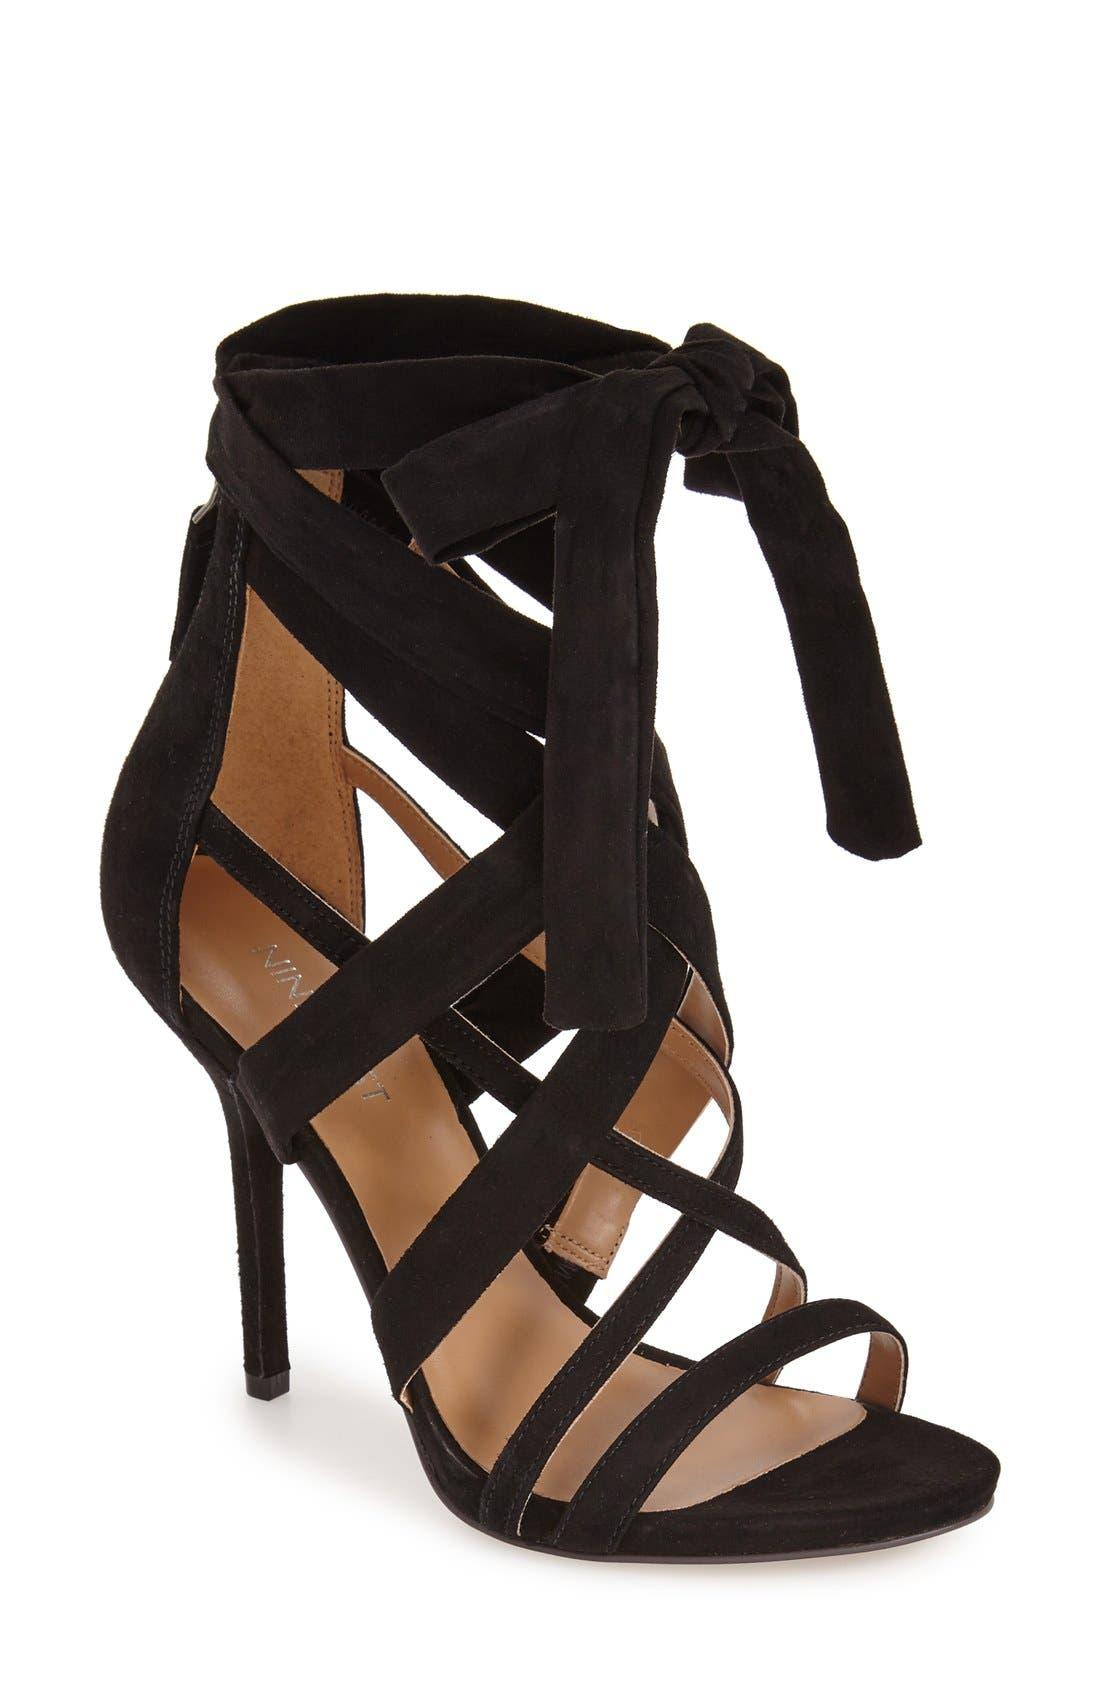 Main Image - Nine West 'Rustic' Sandal (Women)